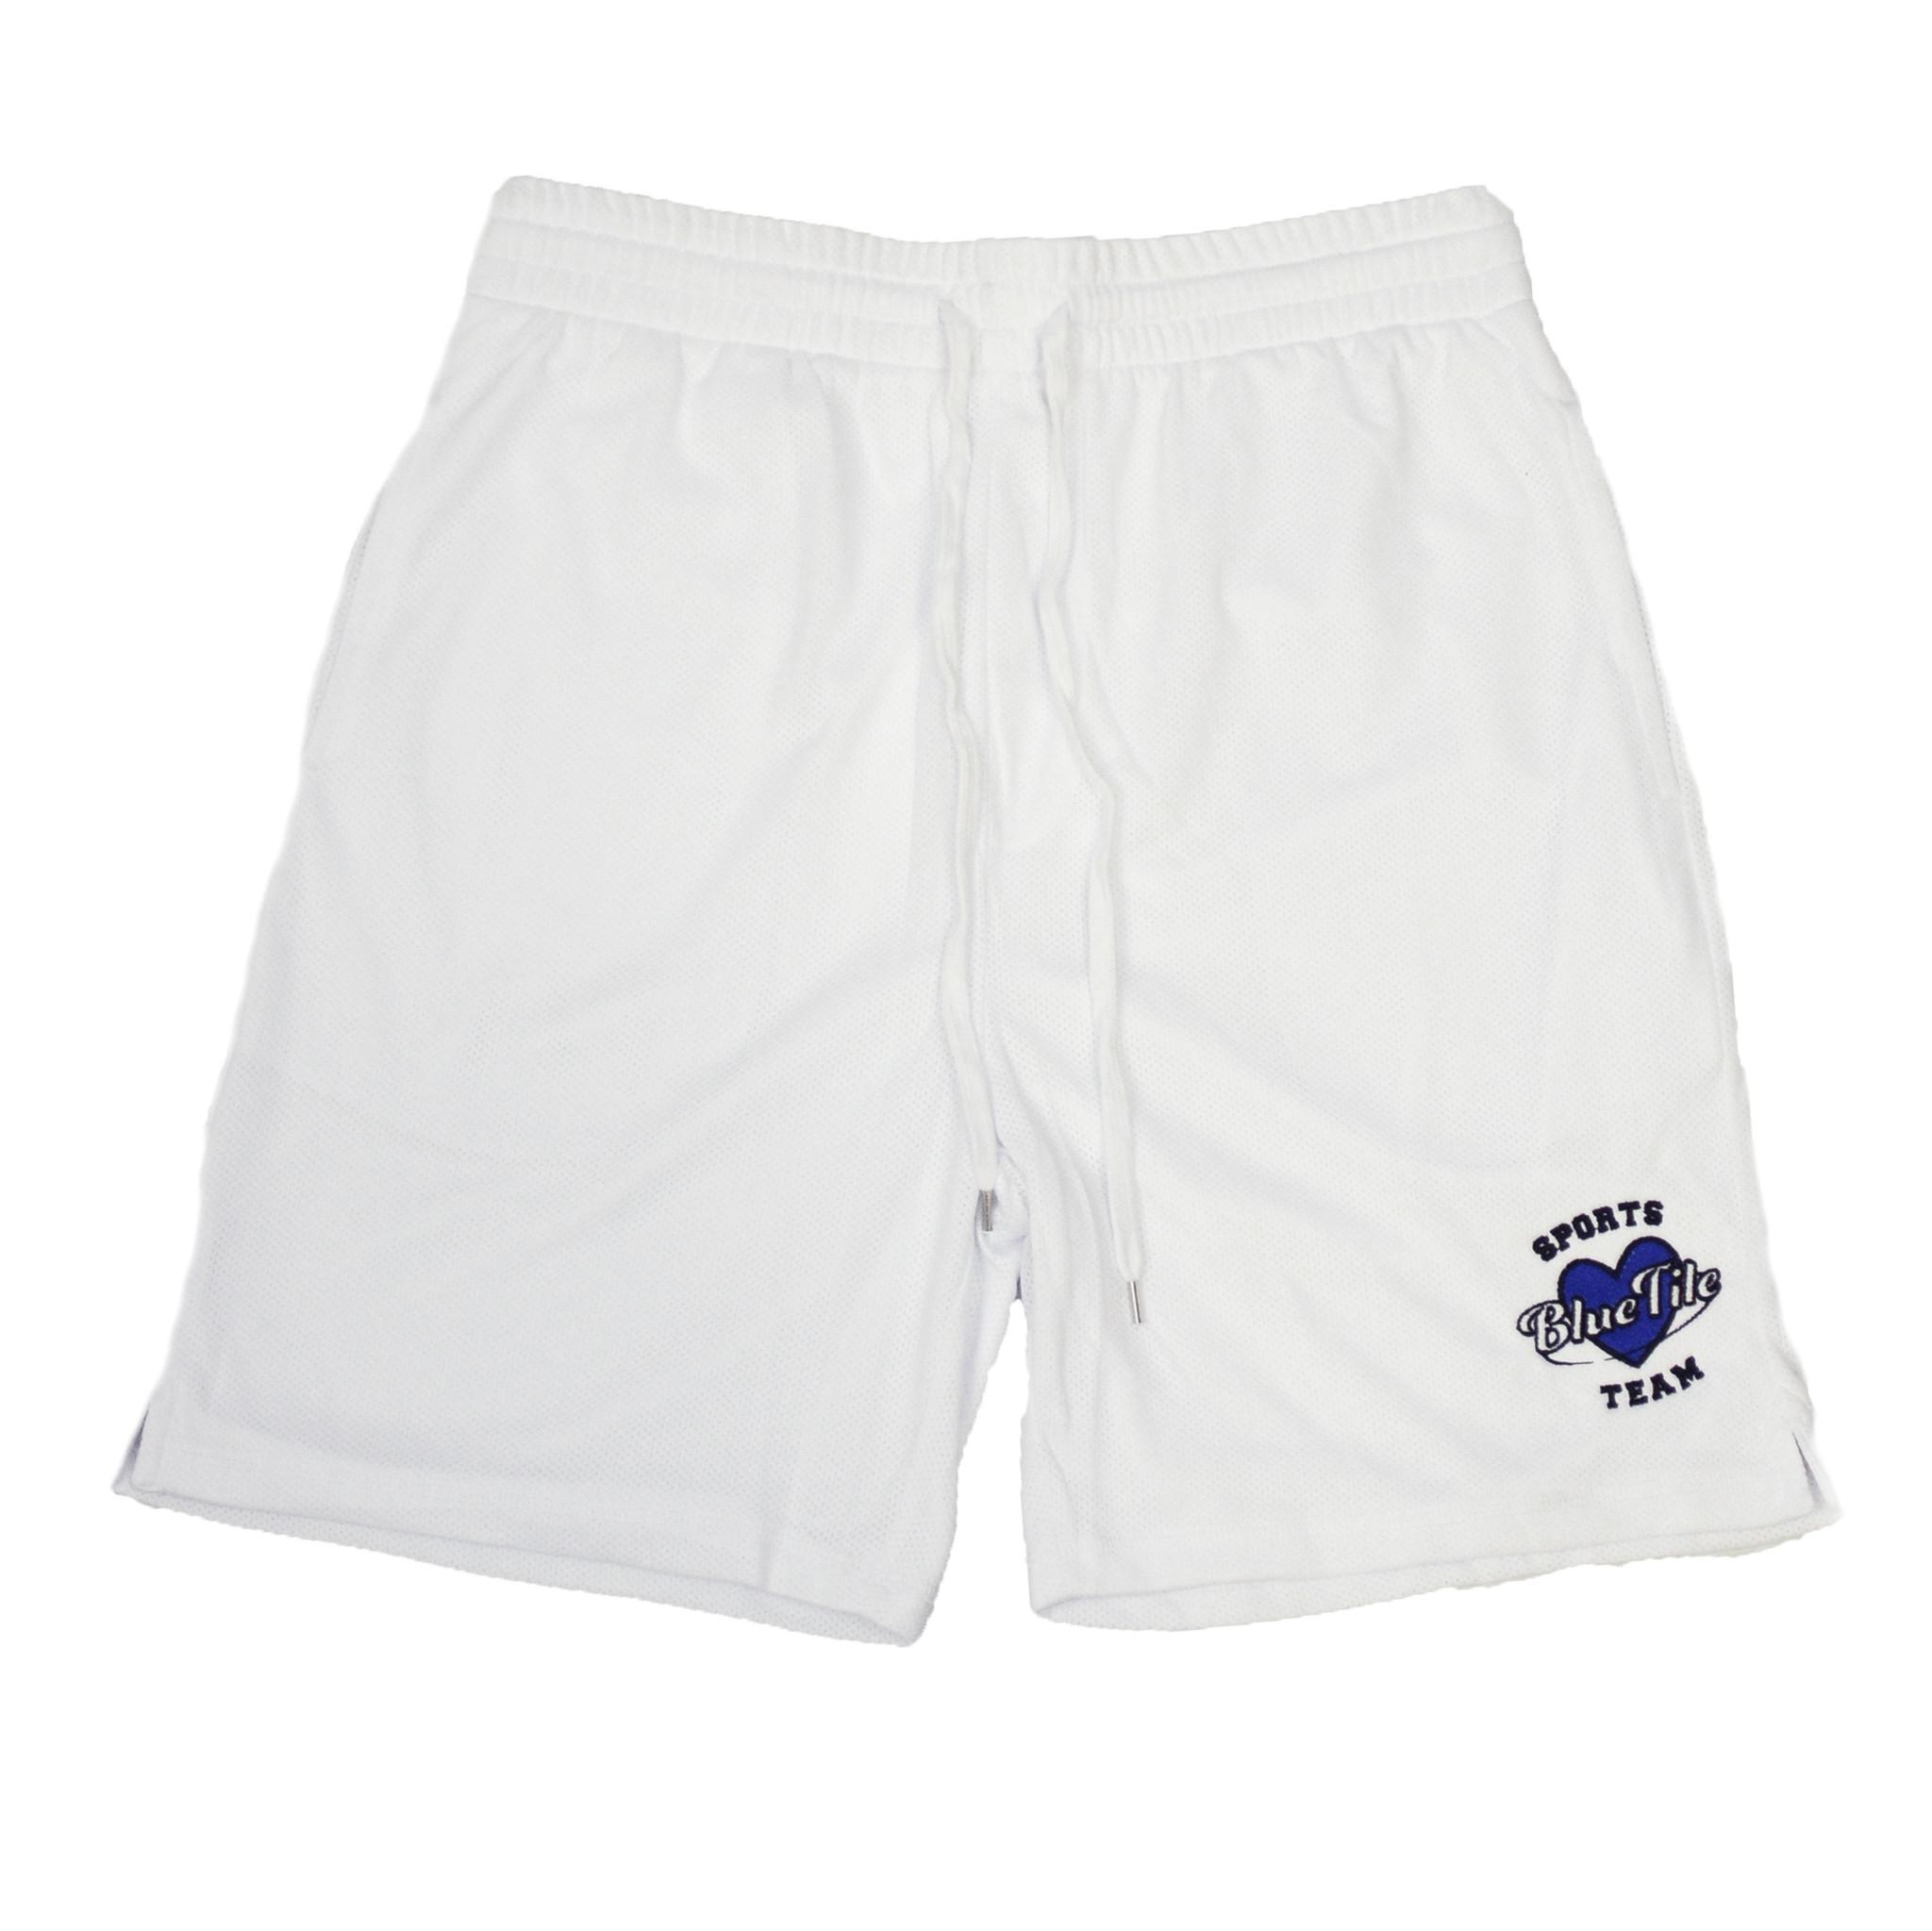 BLUETILE BLUETILE SPORTS BASKETBALL SHORTS WHITE